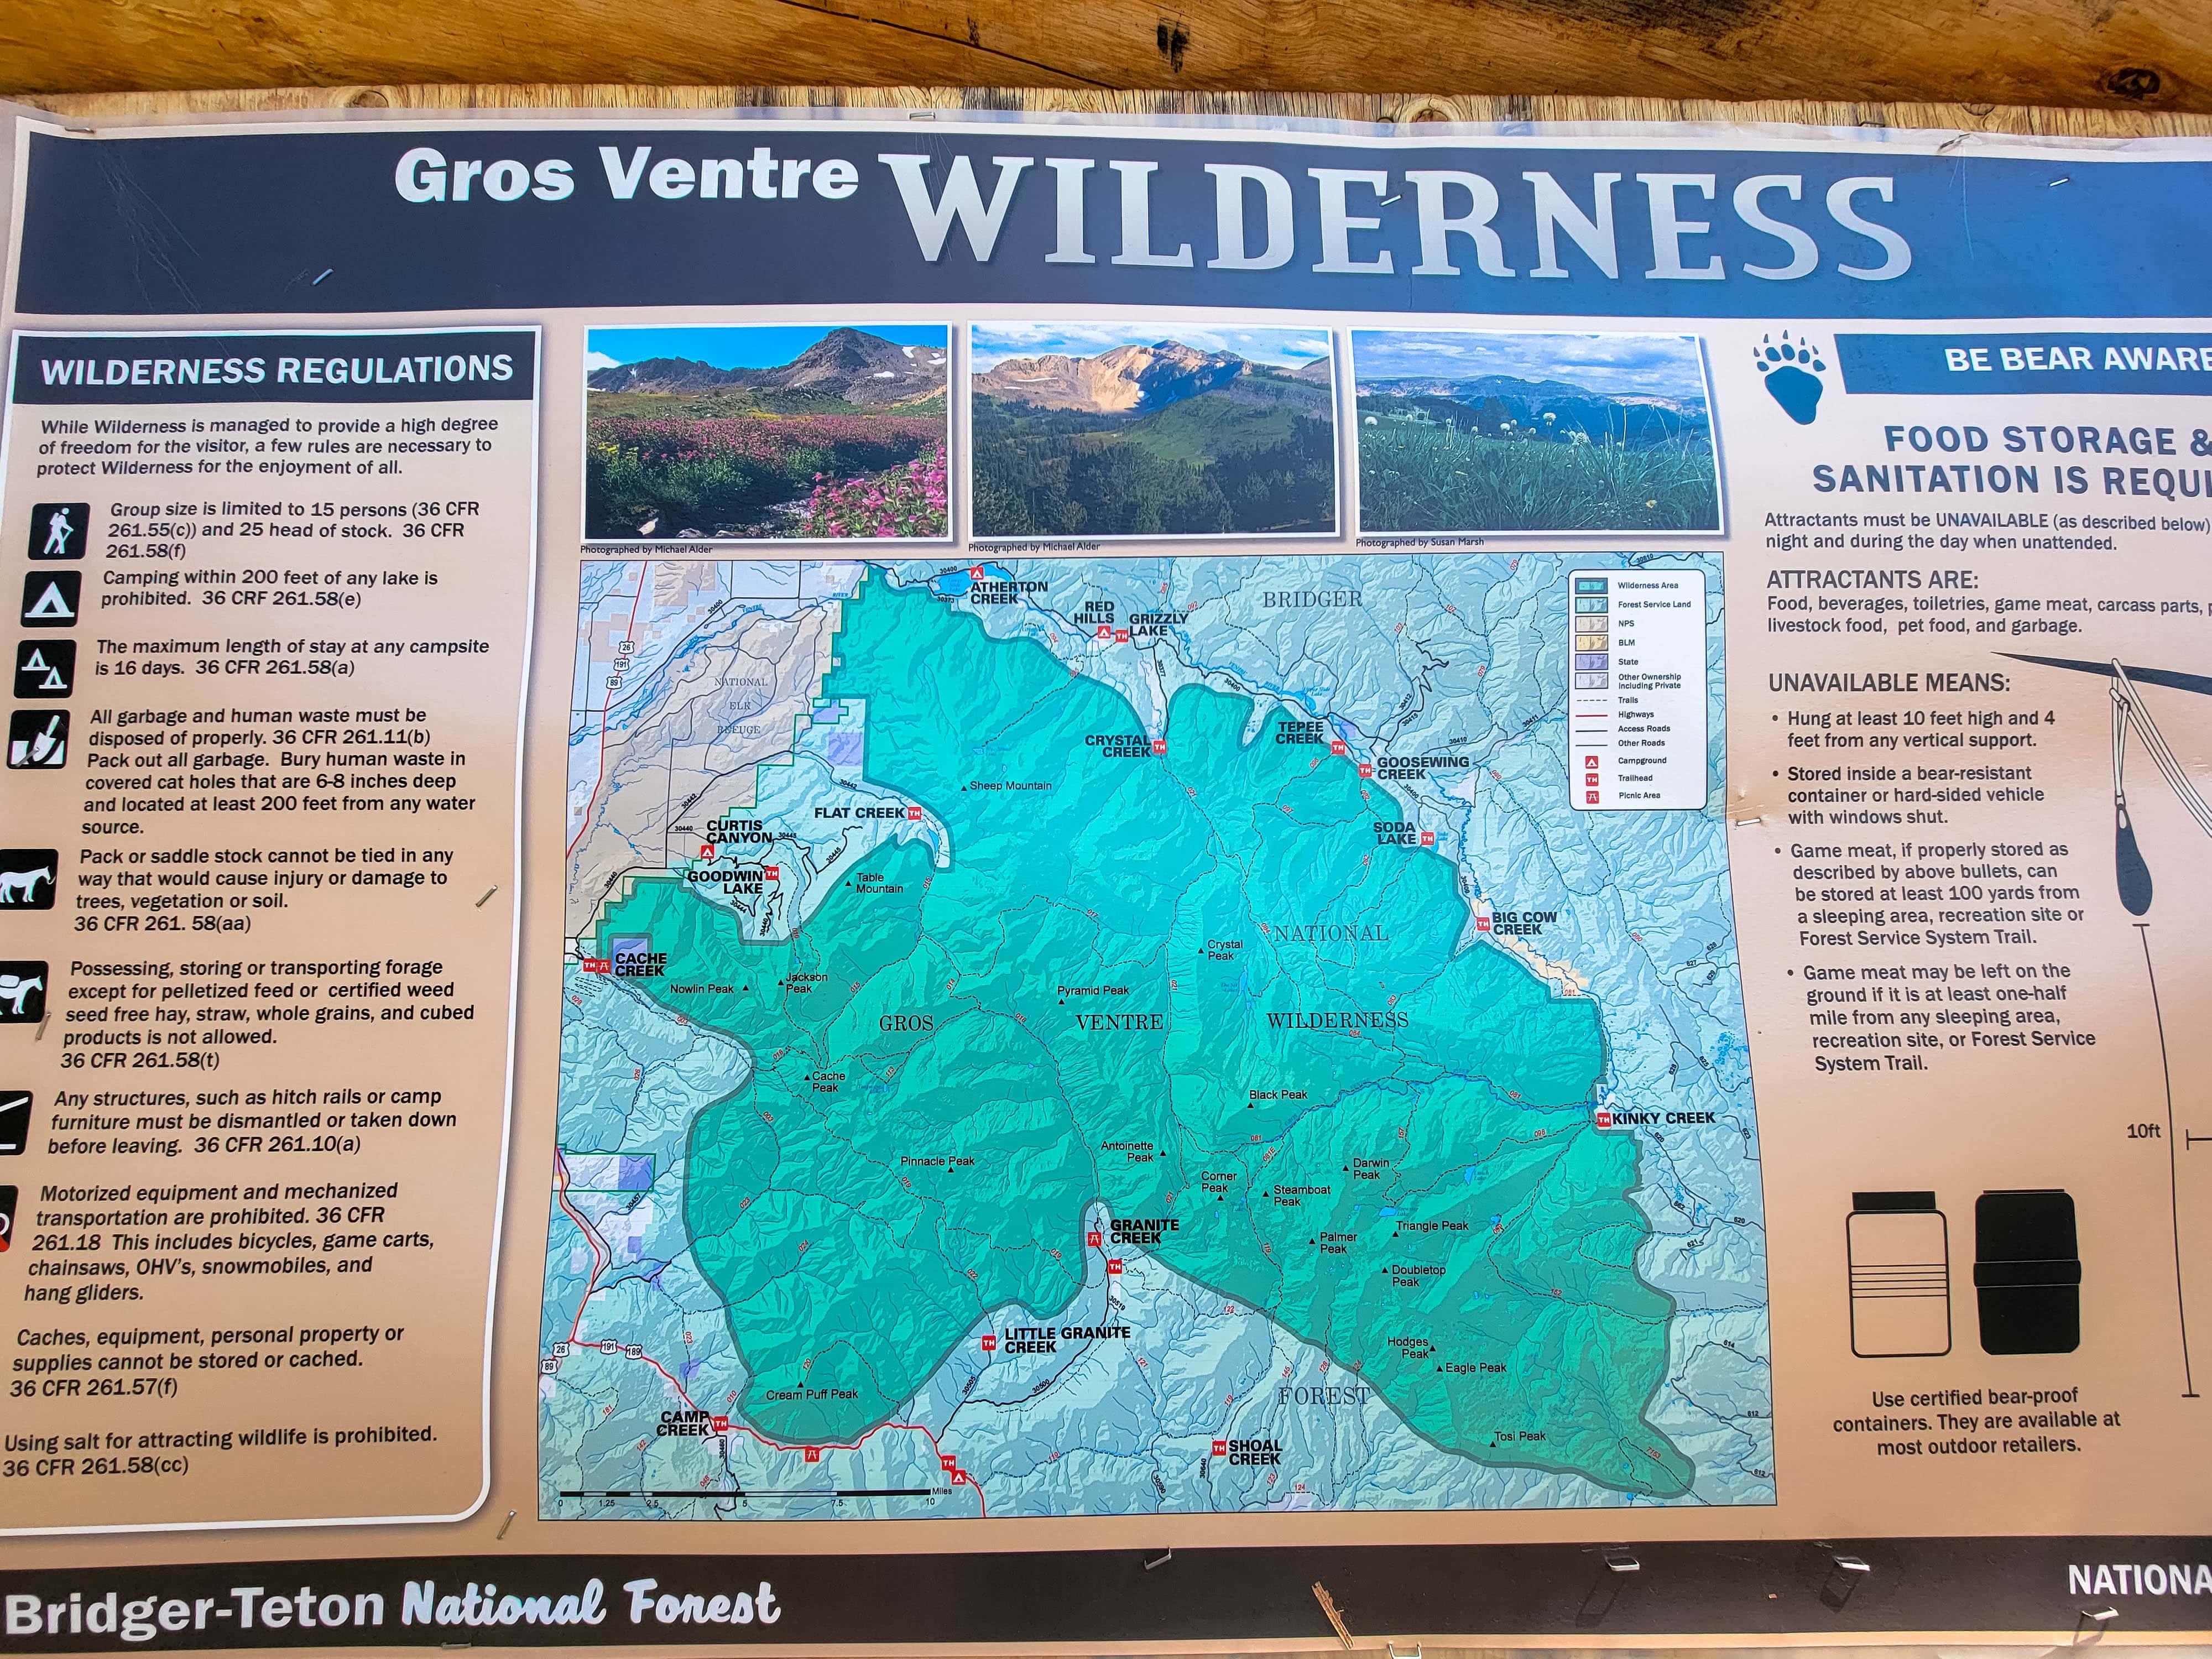 Gros Ventre Wilderness